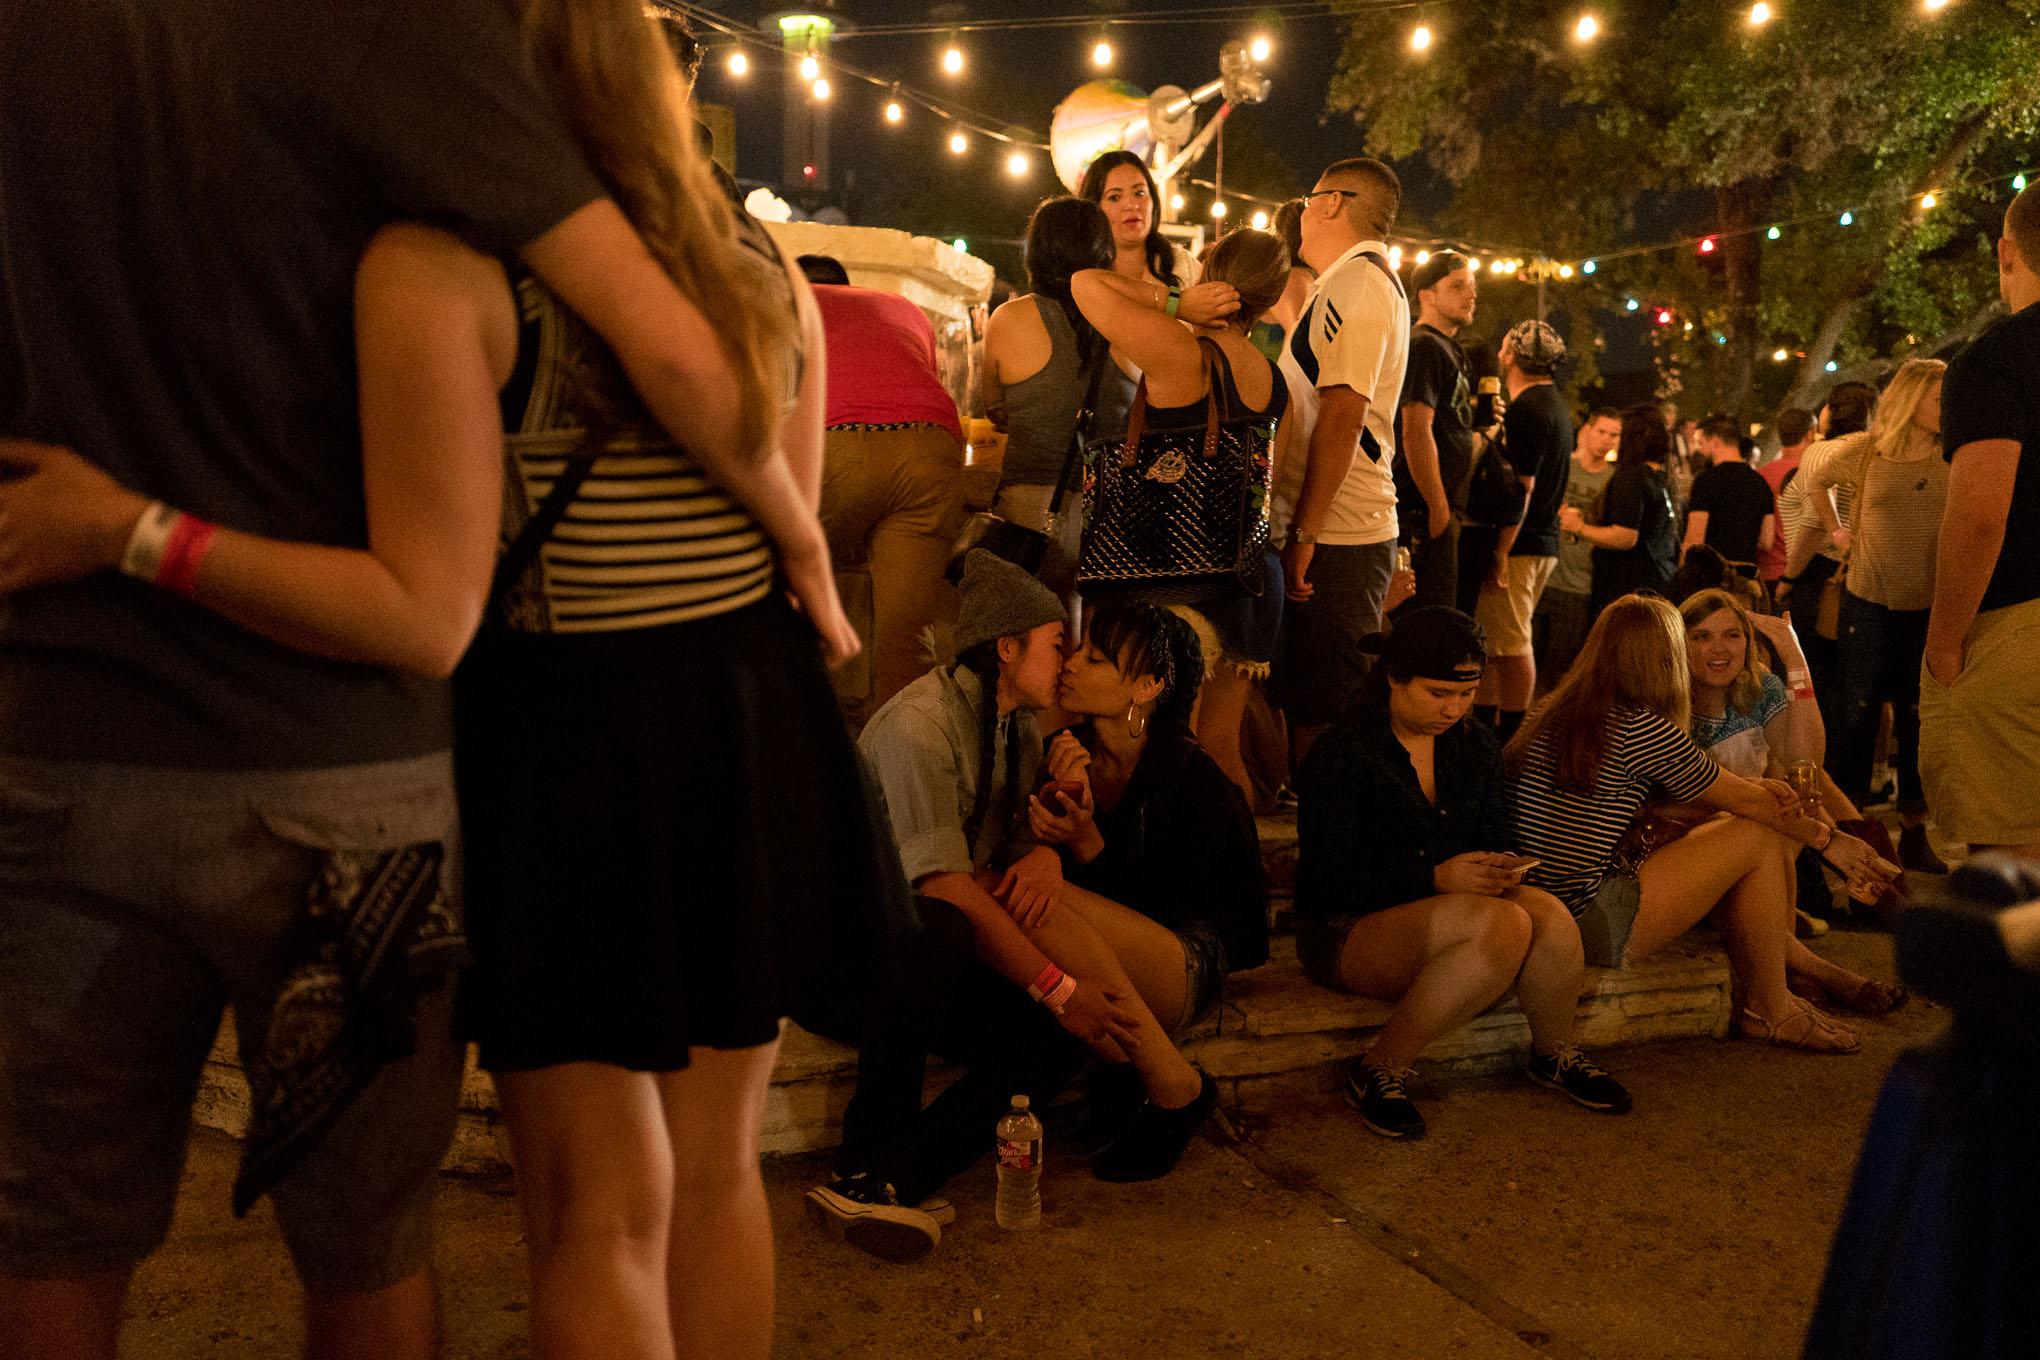 scottball_maverick_music_festival_flaminglips_churches_4-9-2016-11.jpg